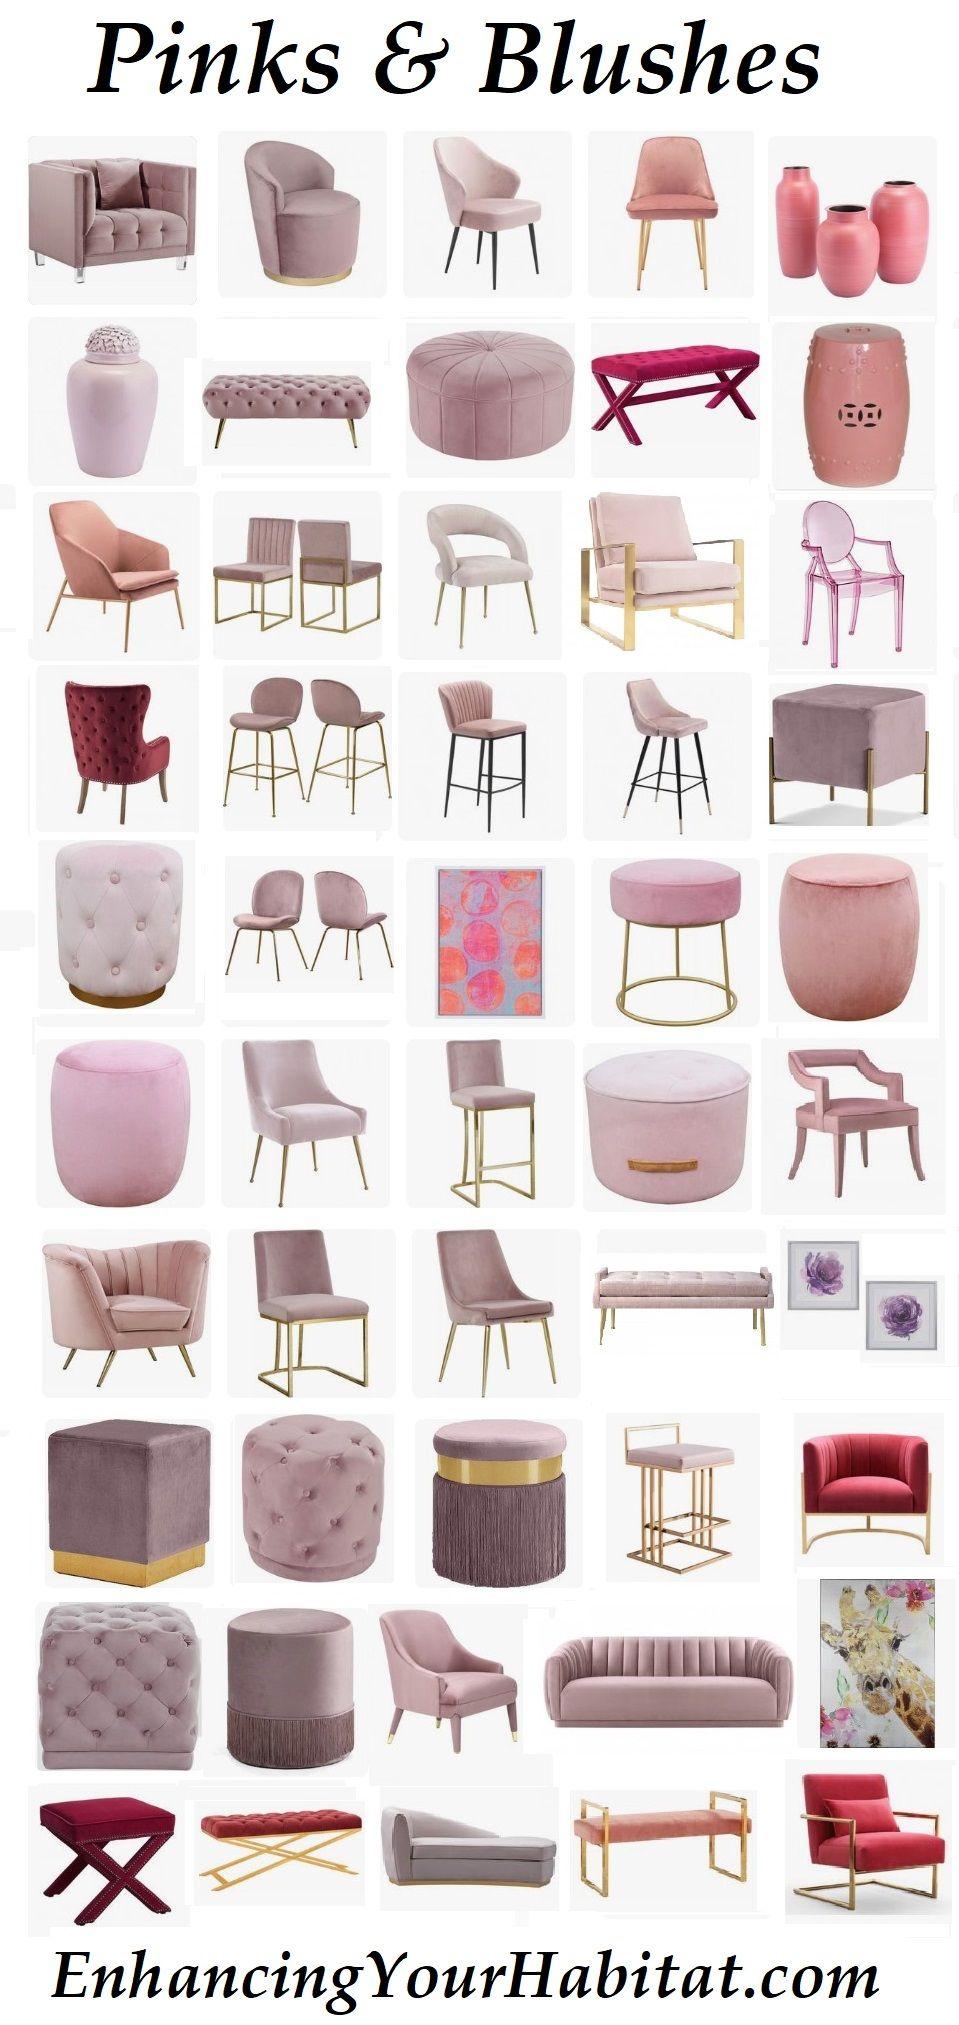 Pink Velvet Pink Blush Mauve Hot Pink Fuschia Furniture Home Accessories Home Decor Pink Velvet Sofa Pink Vel Pink Furniture Pink Bar Stools Home Room Design